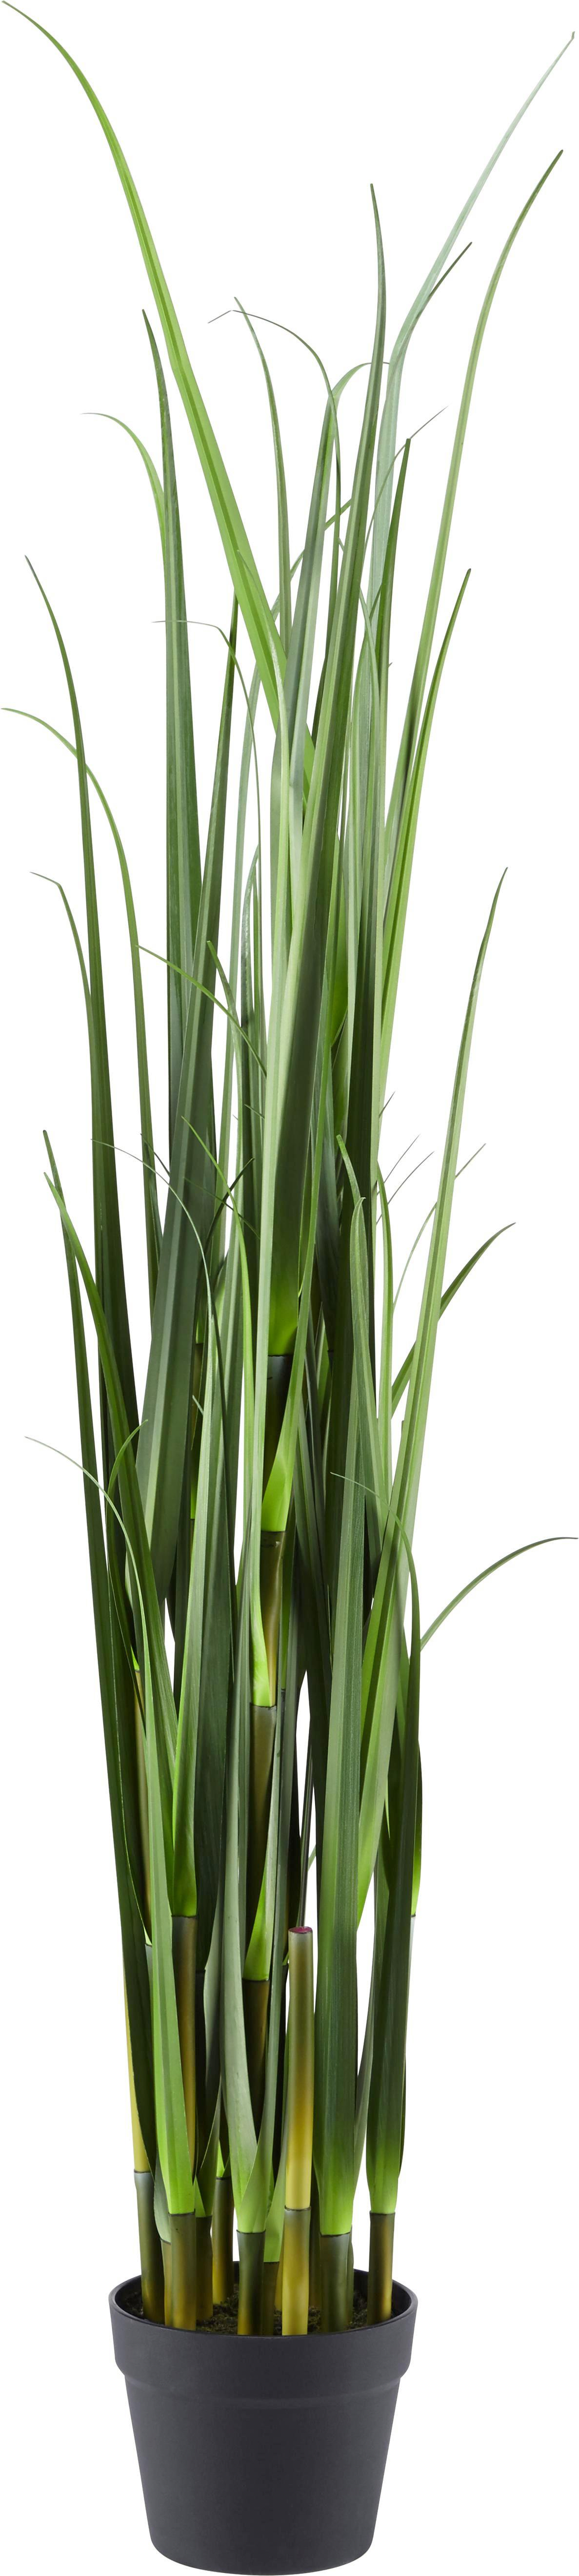 Kunstpflanze Mica in Grün - Grün, Kunststoff (120cm) - MÖMAX modern living